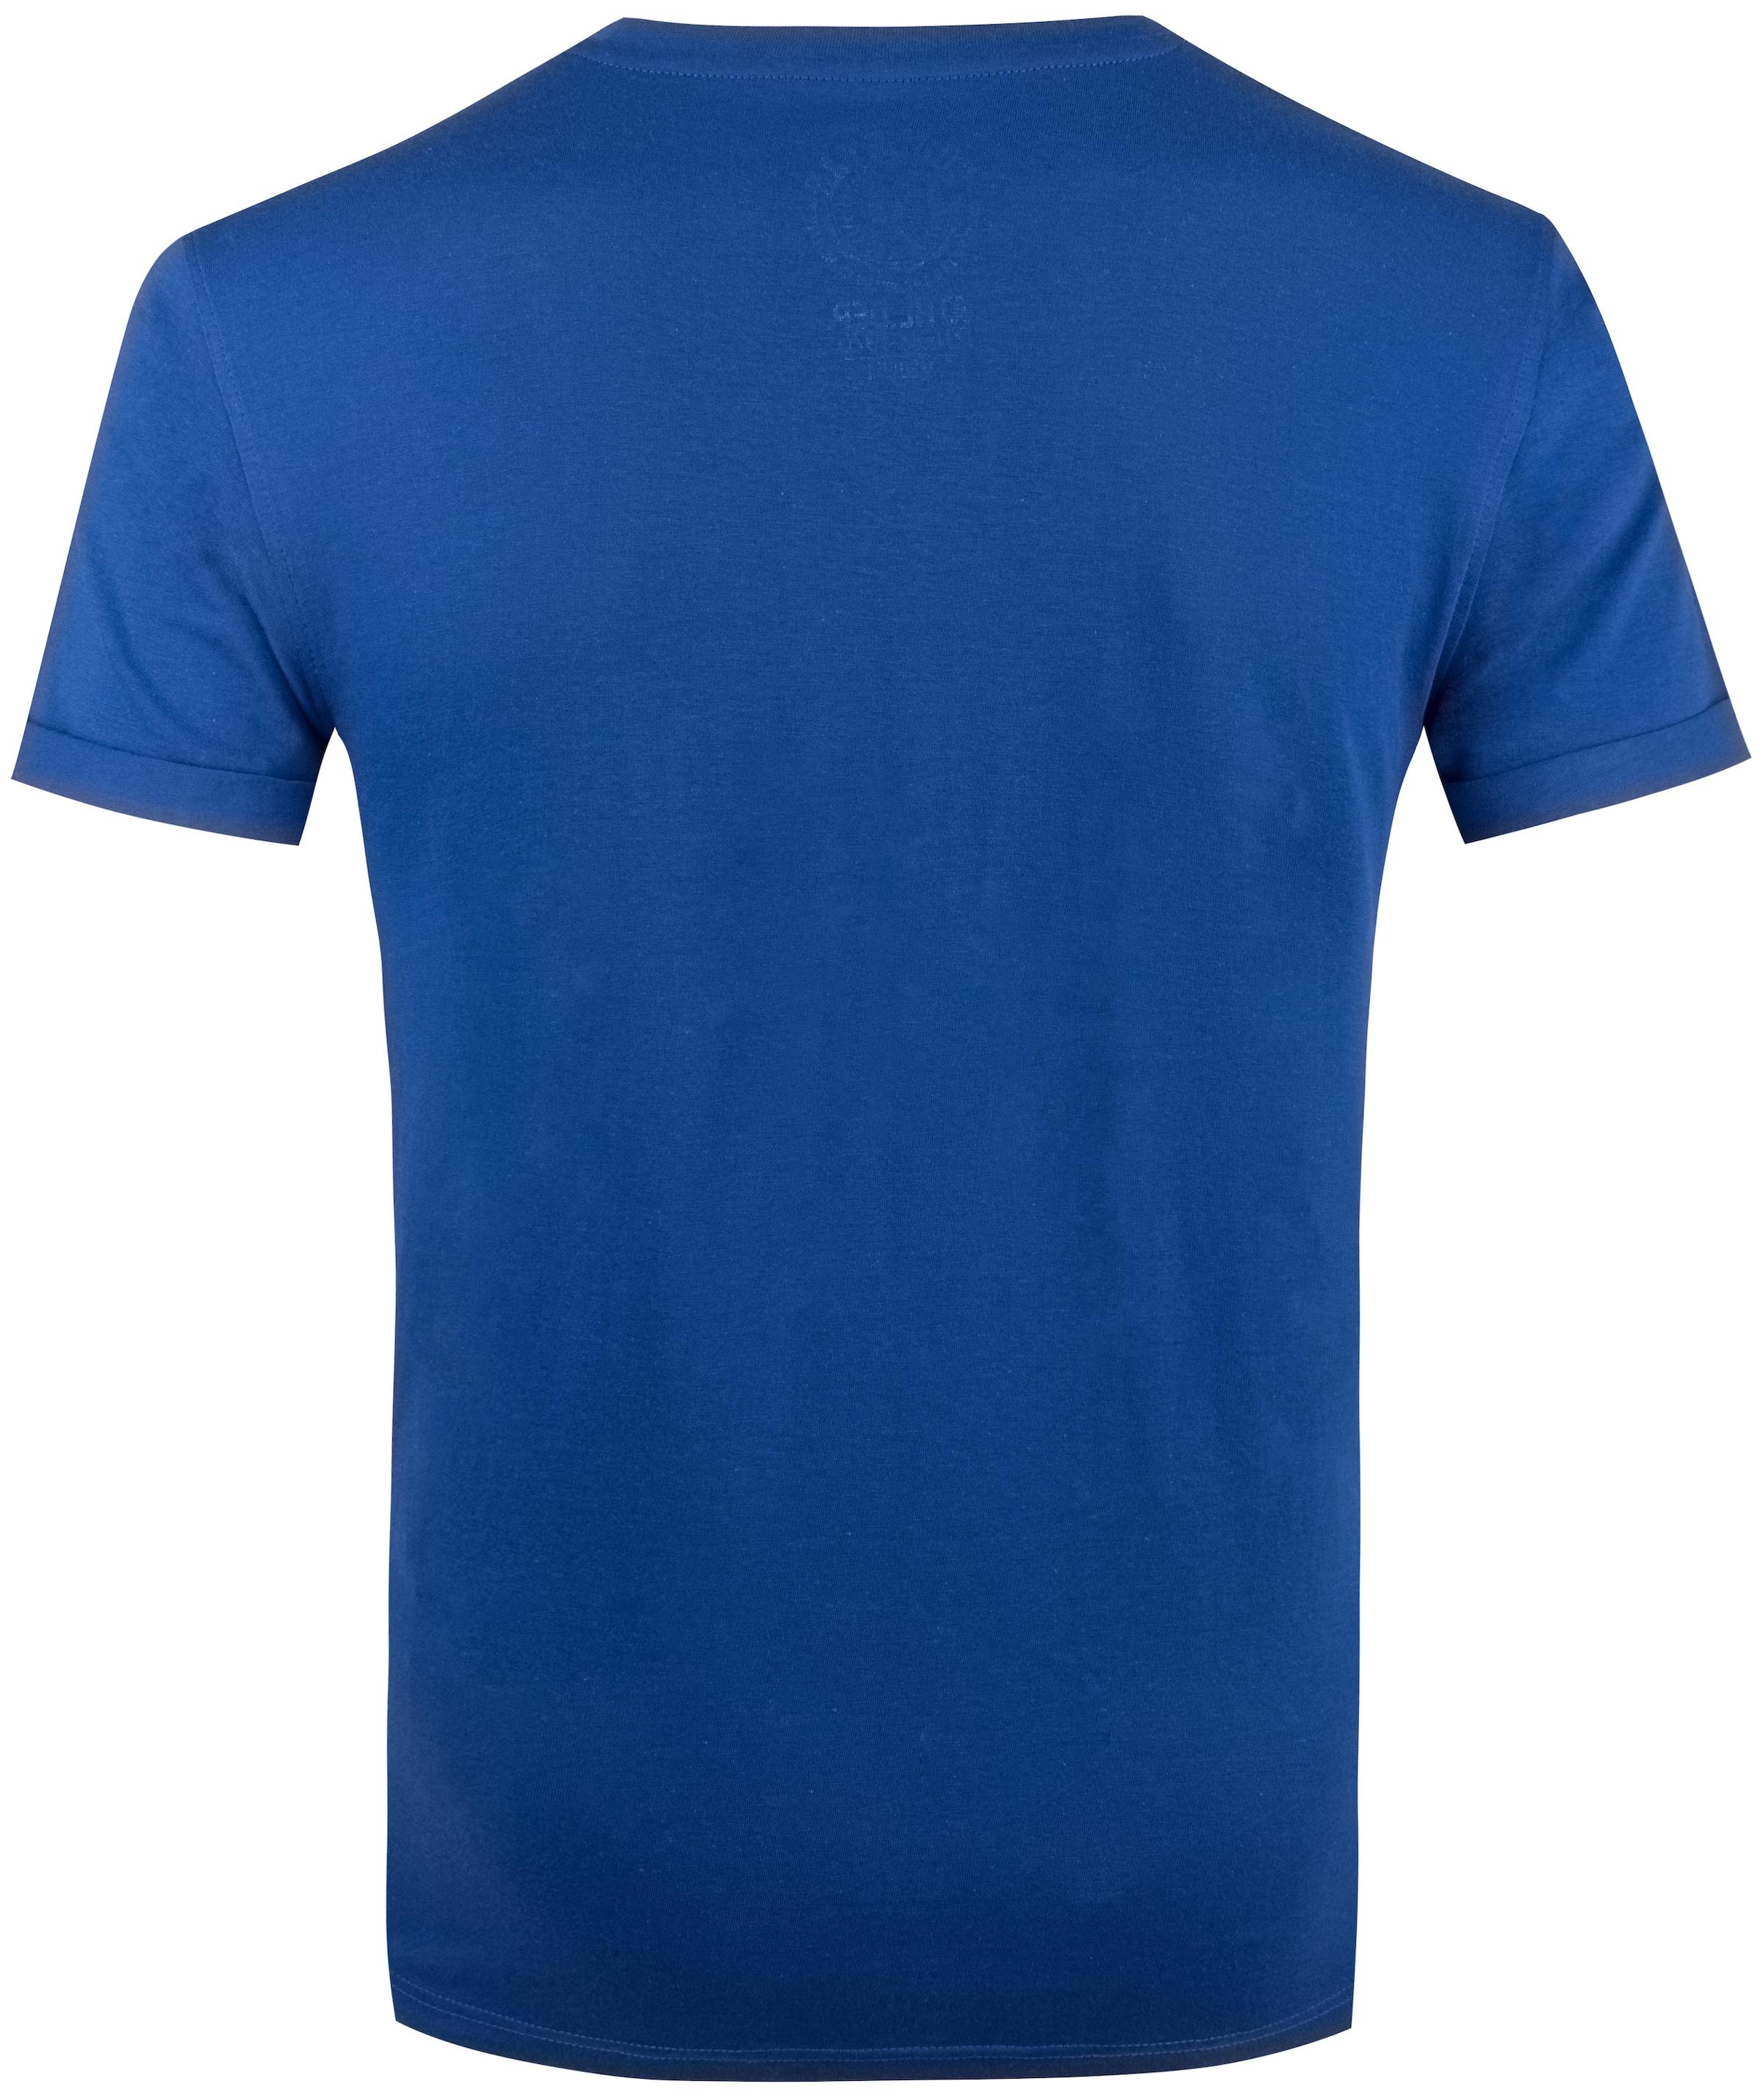 Professionel SOULSTAR T-Shirt Rabatt Shop-Angebot USDdiDr7